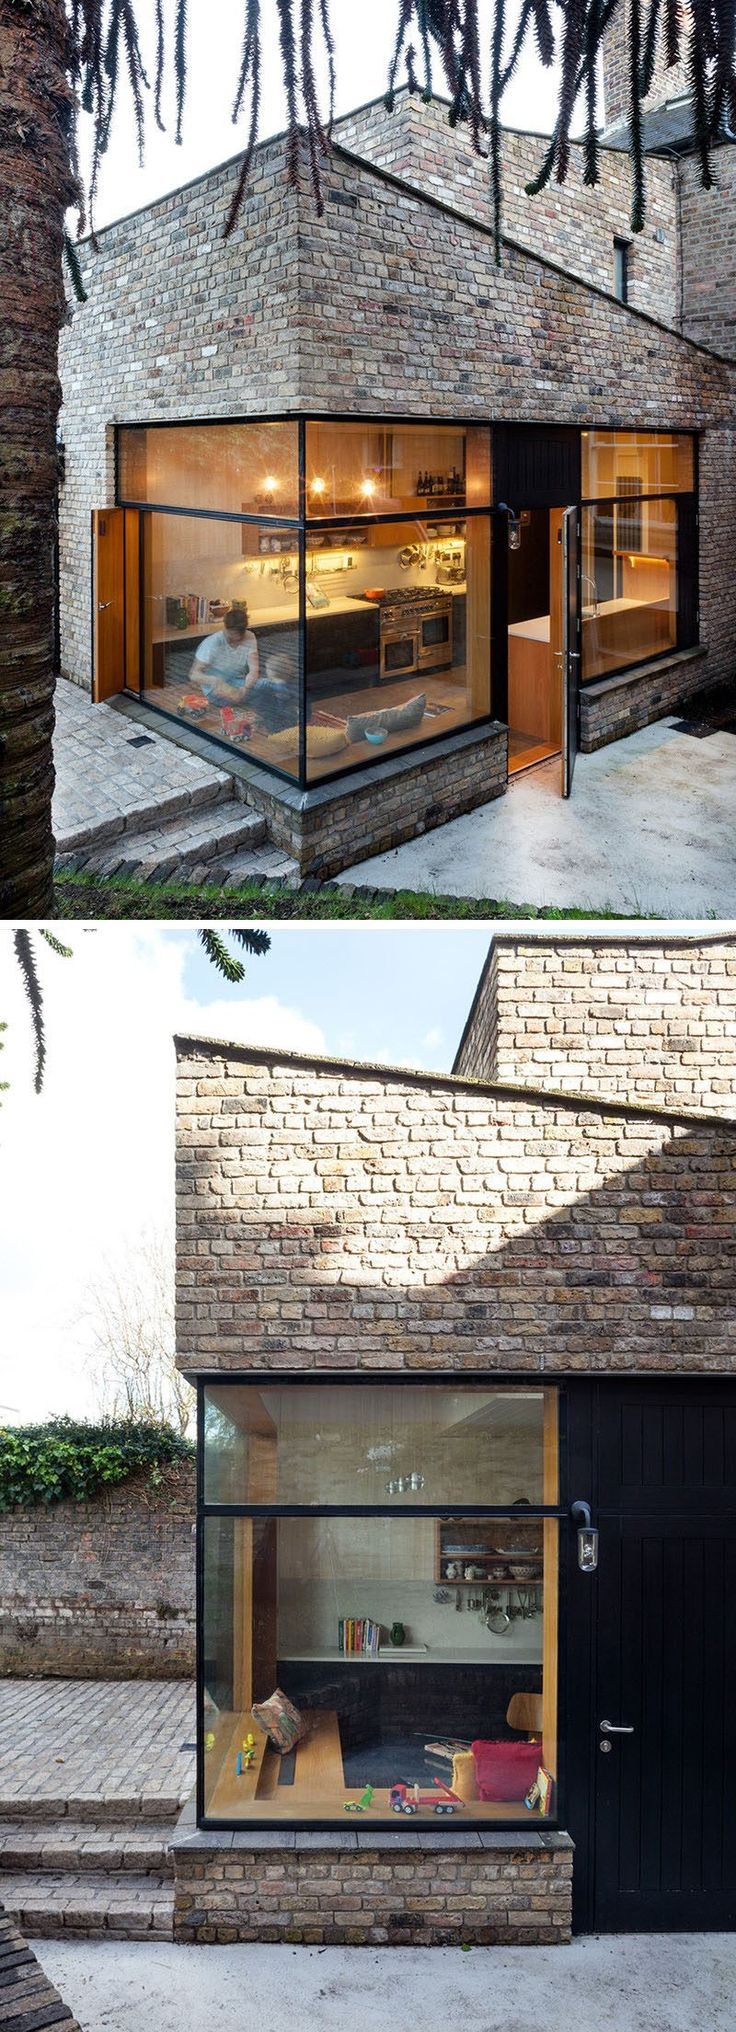 ^ 1000+ ideas about Lichthaus on Pinterest Fachwerk, Led ...